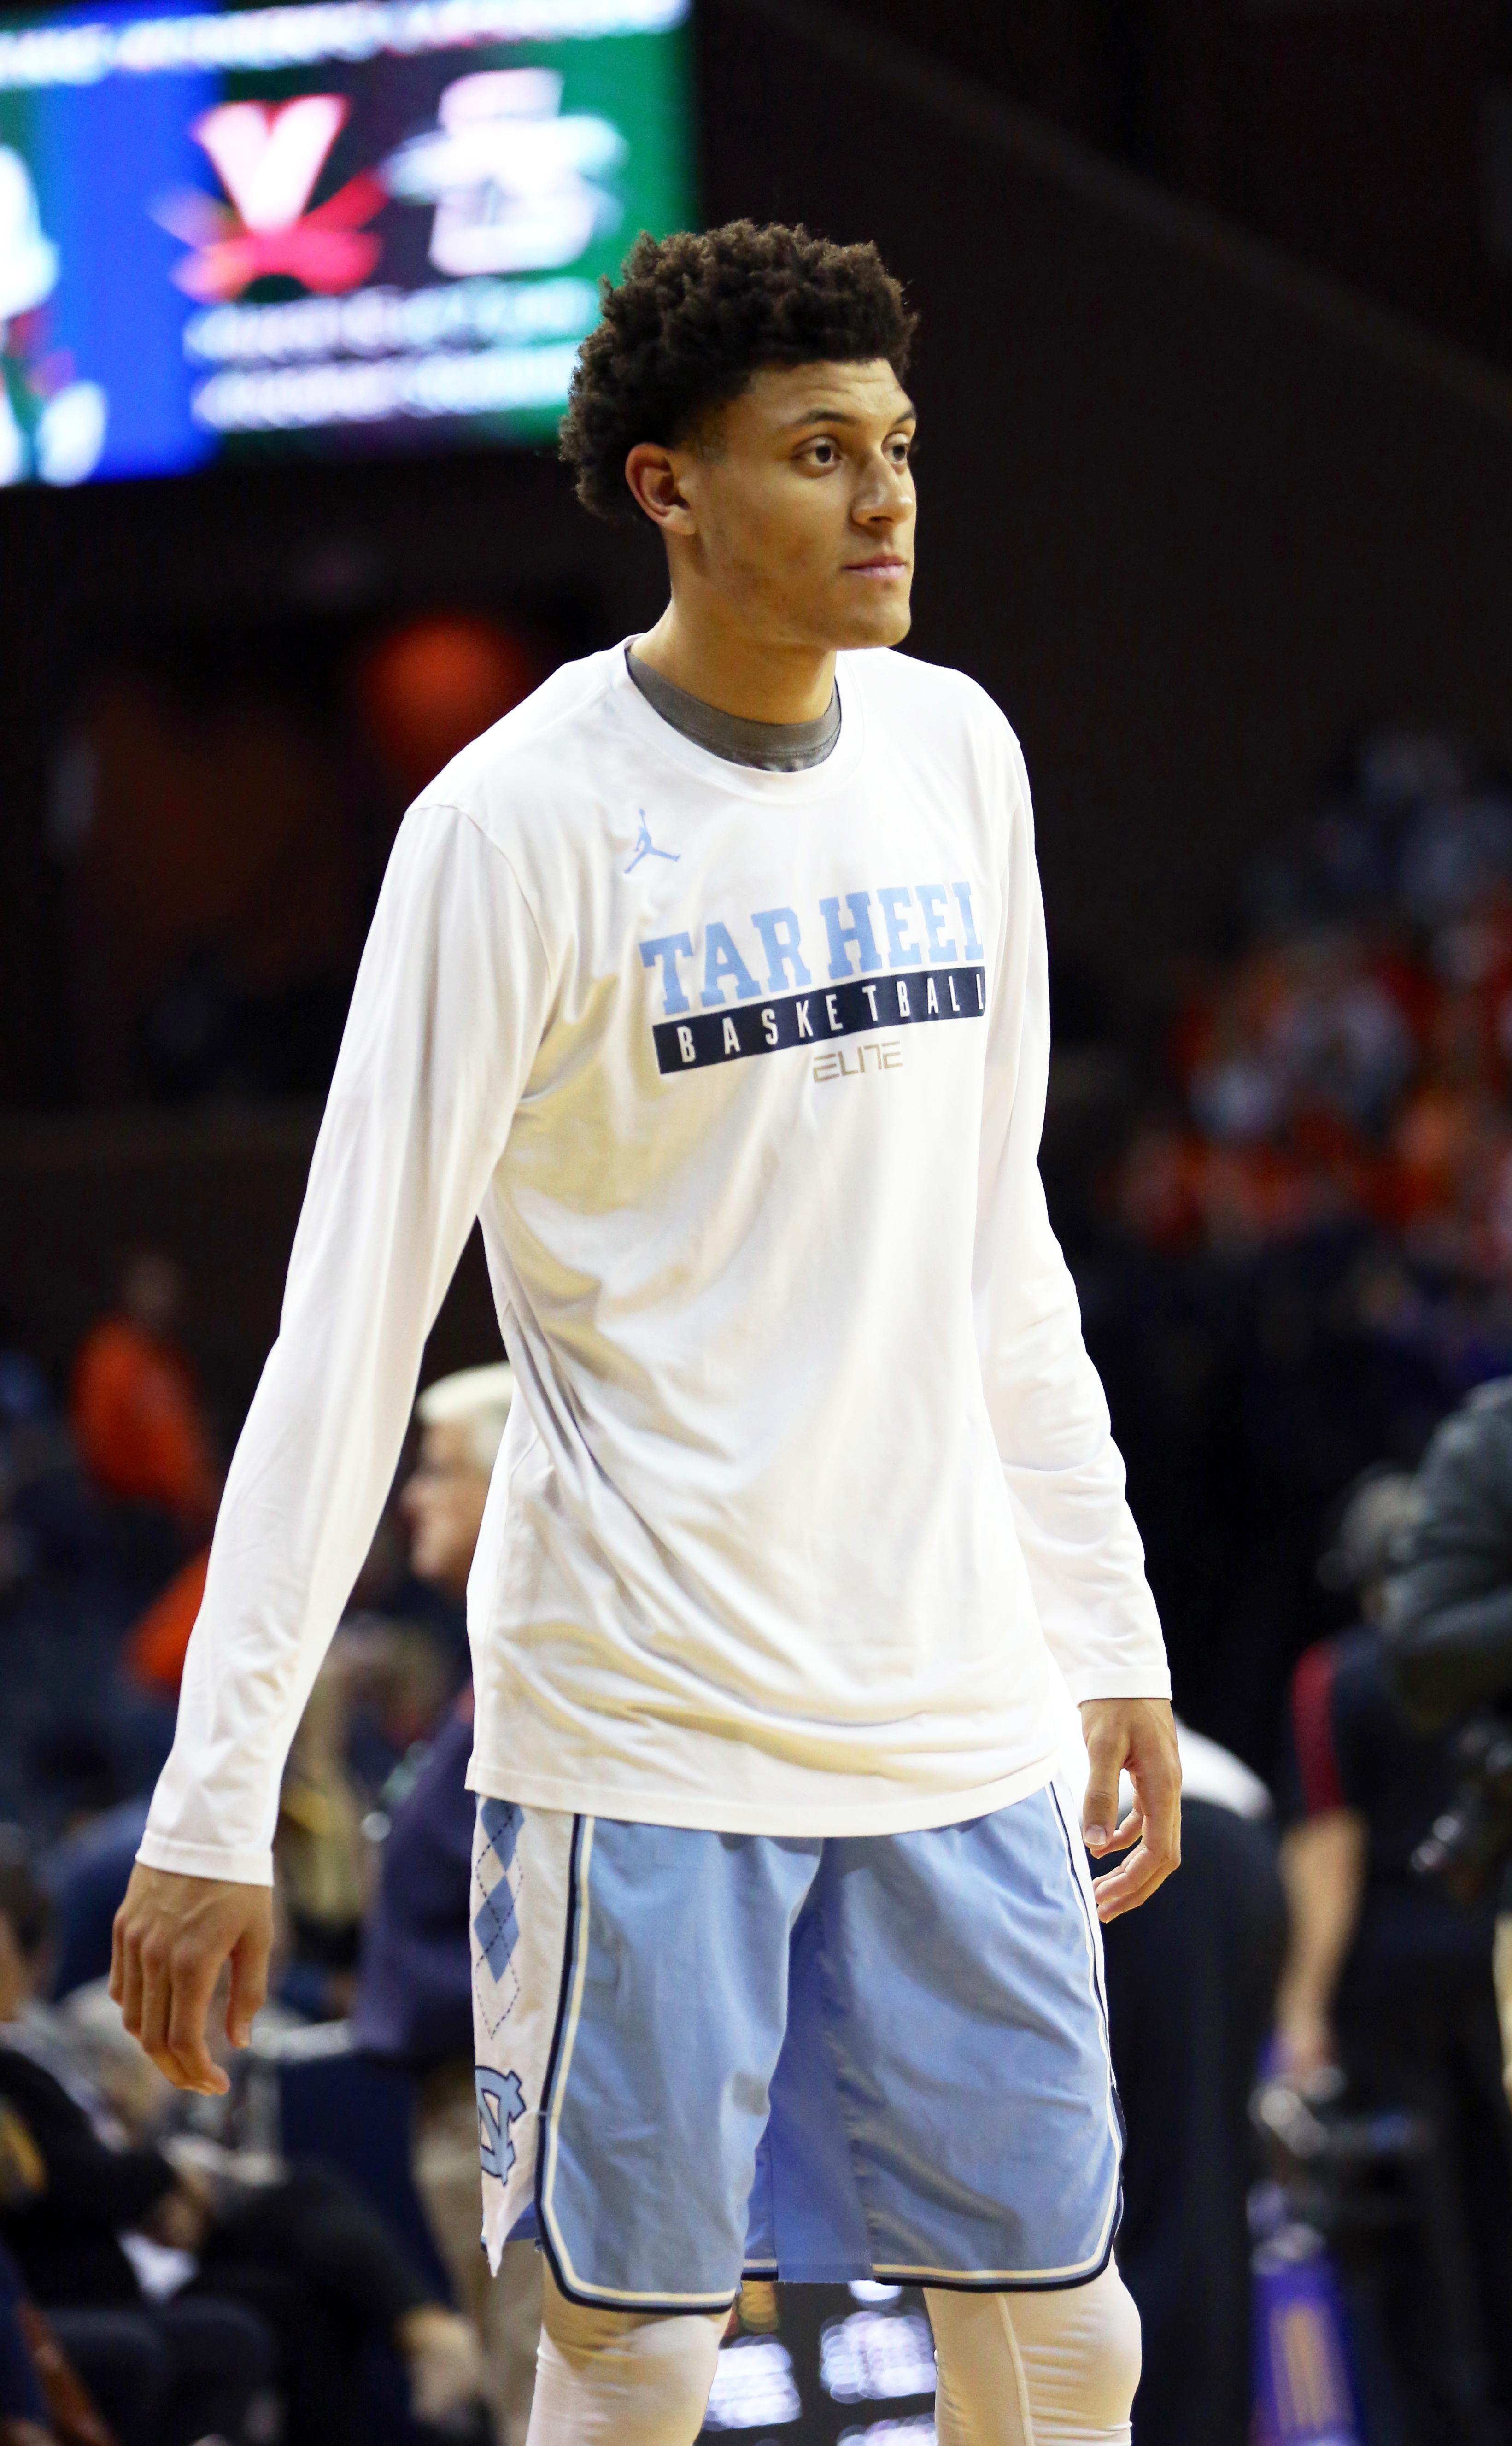 bedf71d3594c Justin Jackson (basketball